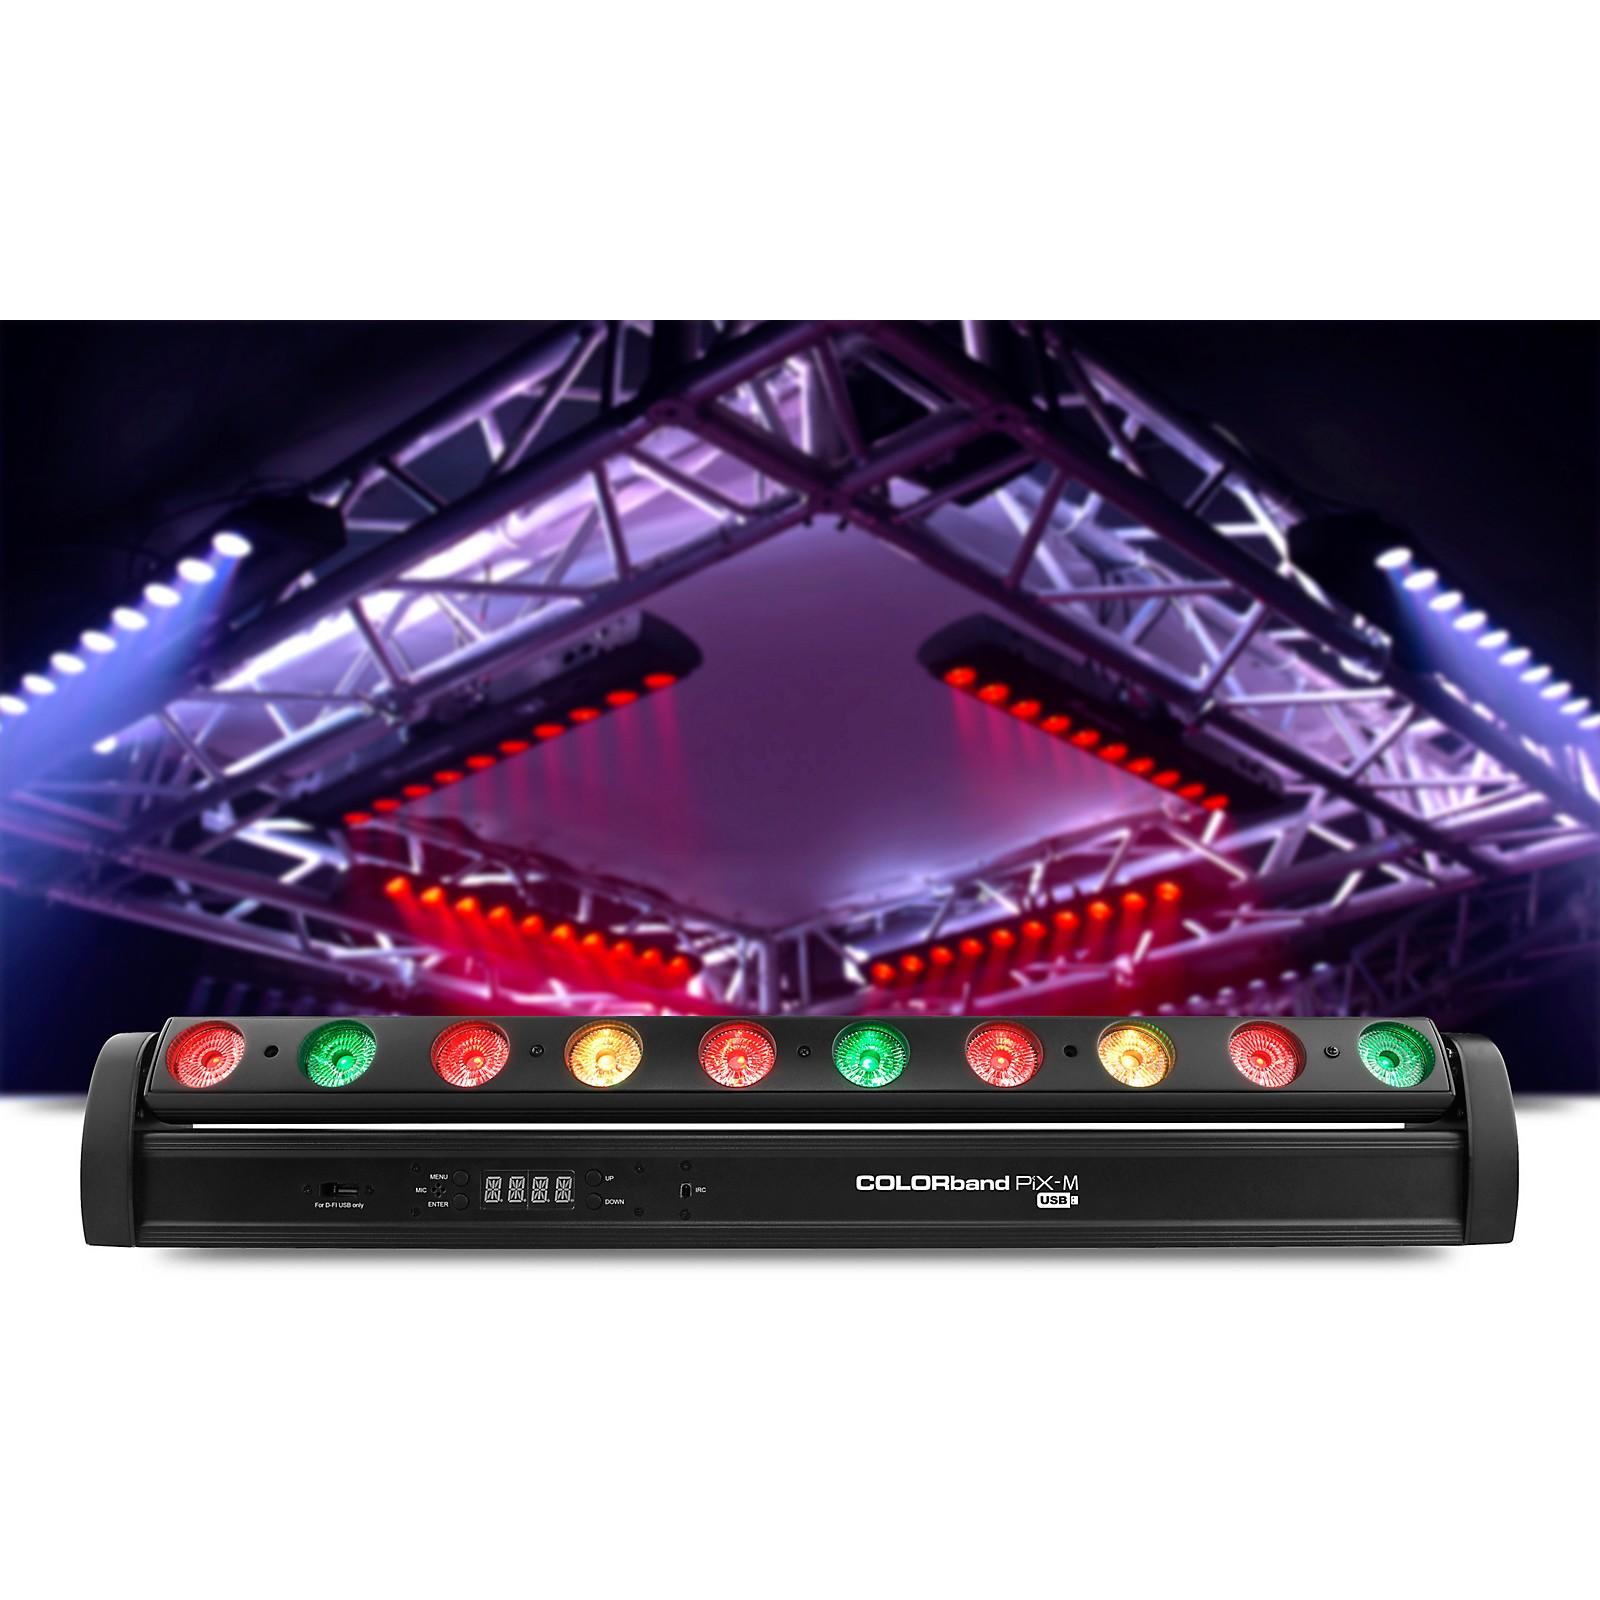 CHAUVET DJ COLORband PIX USB RGB LED Wash Light Bar with Pixel Mapping